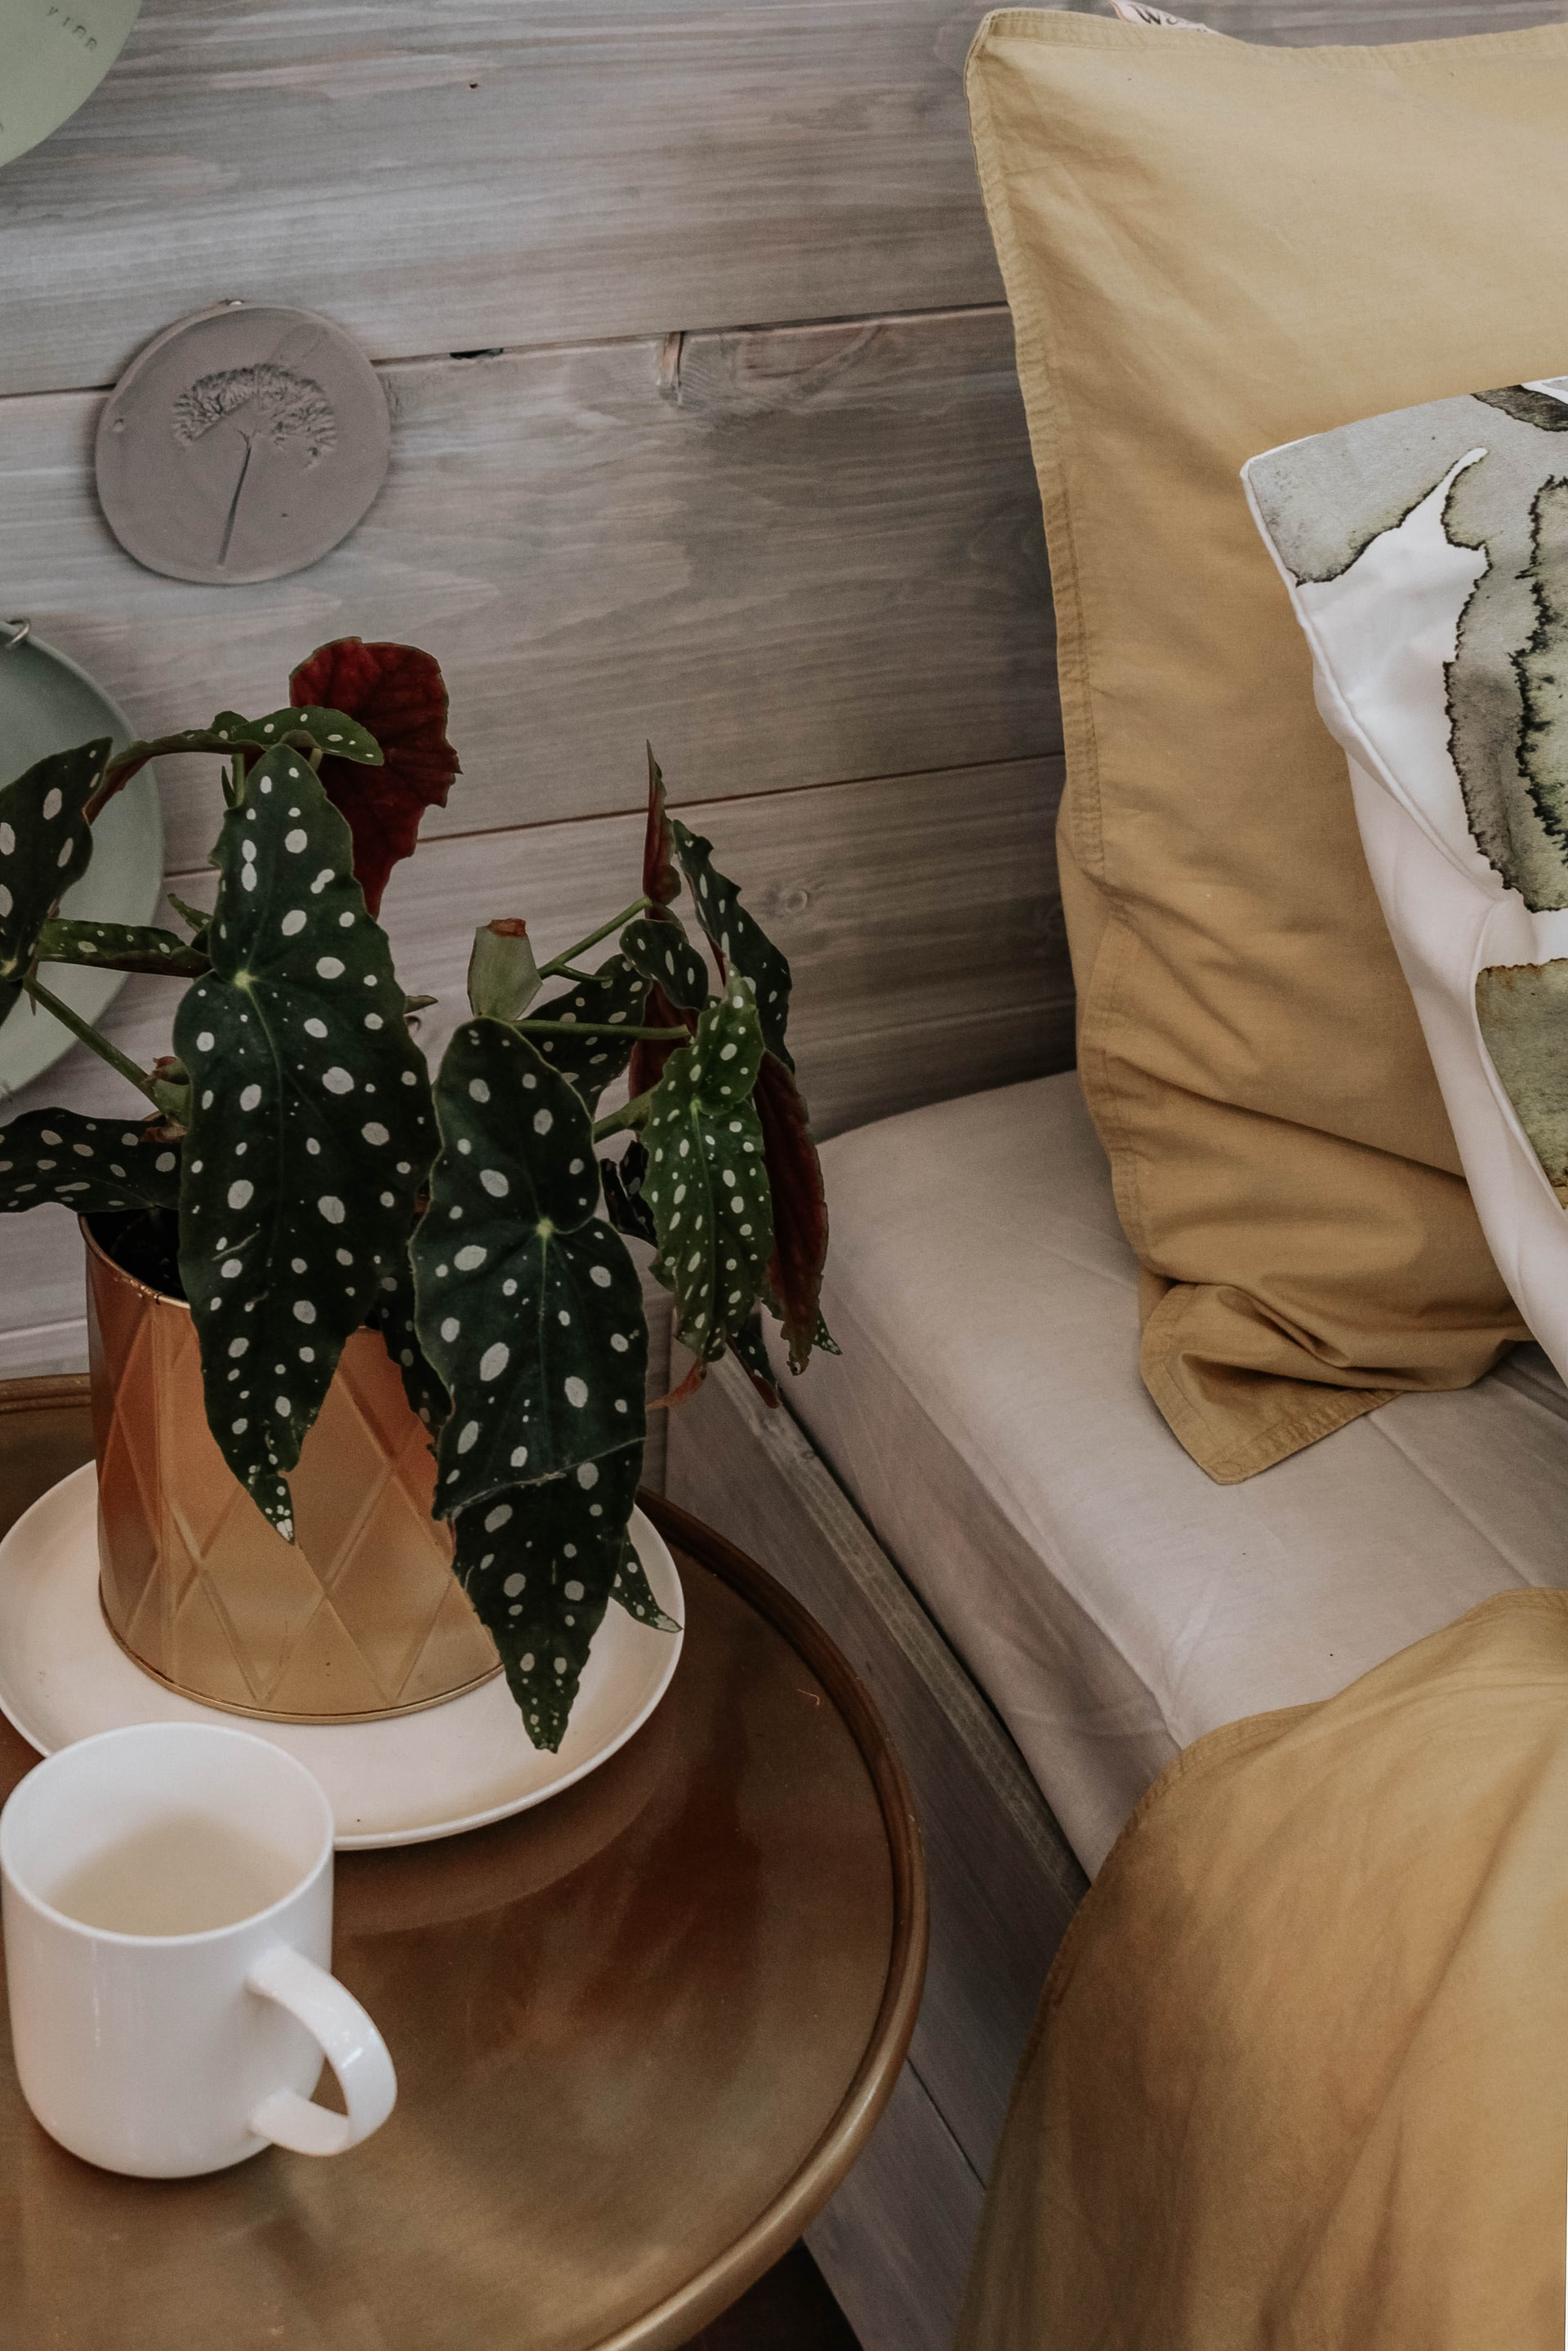 plants on bedside table